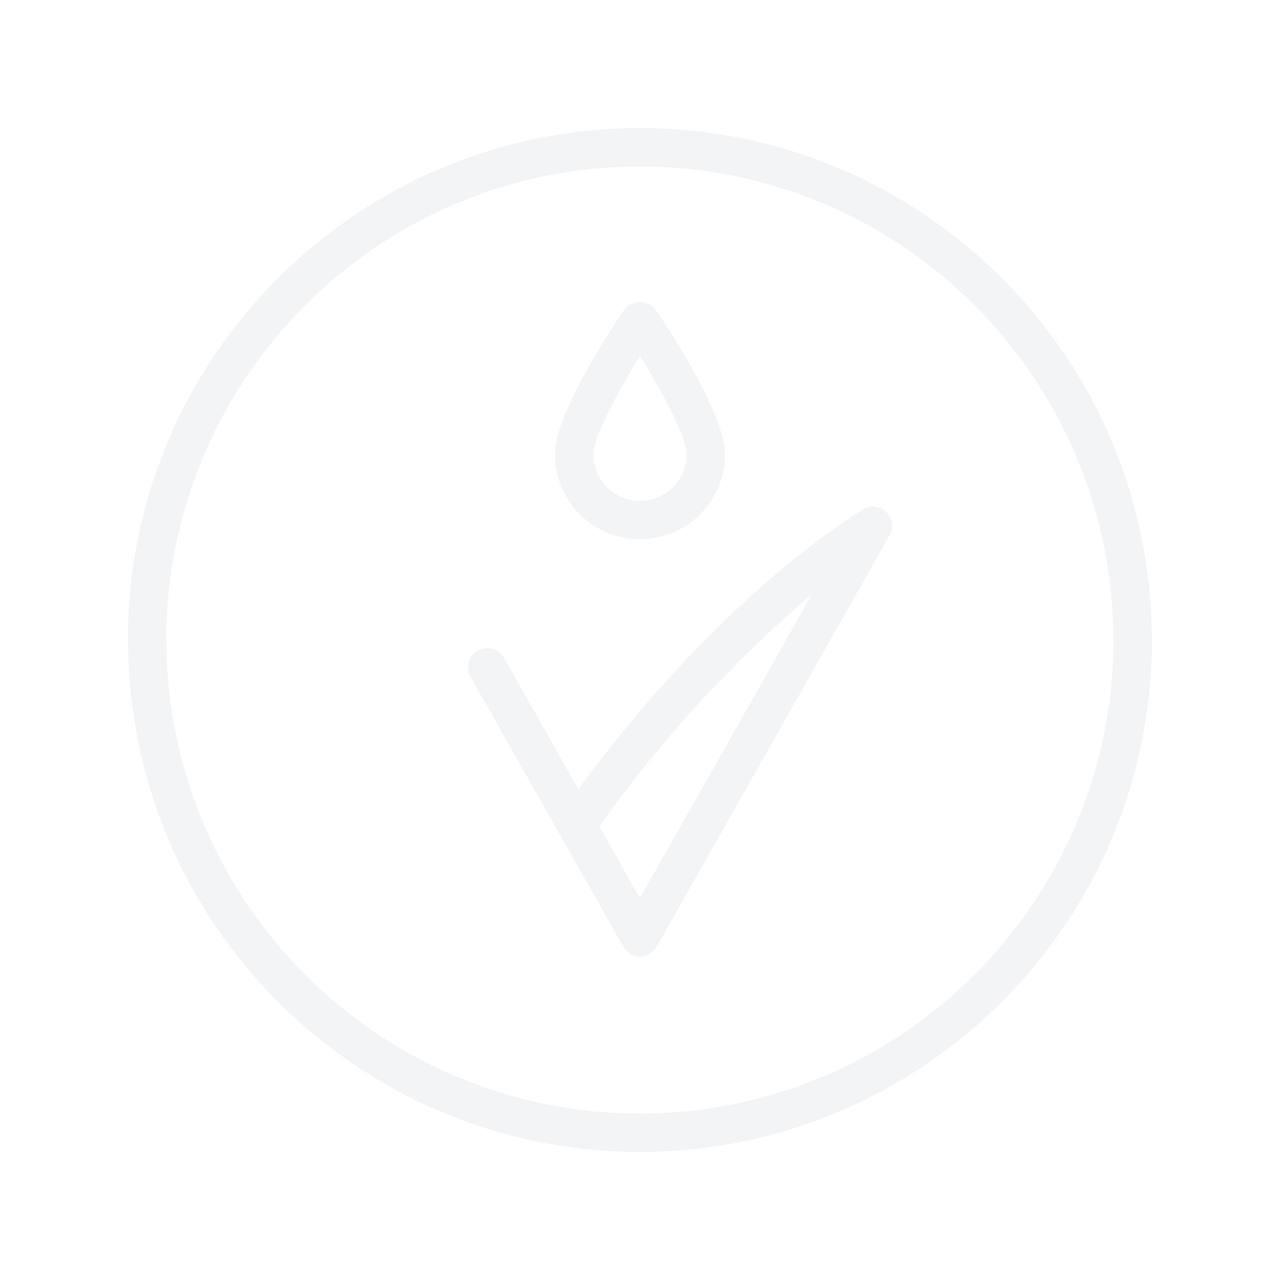 ARTDECO Eye Make-Up Remover 125ml